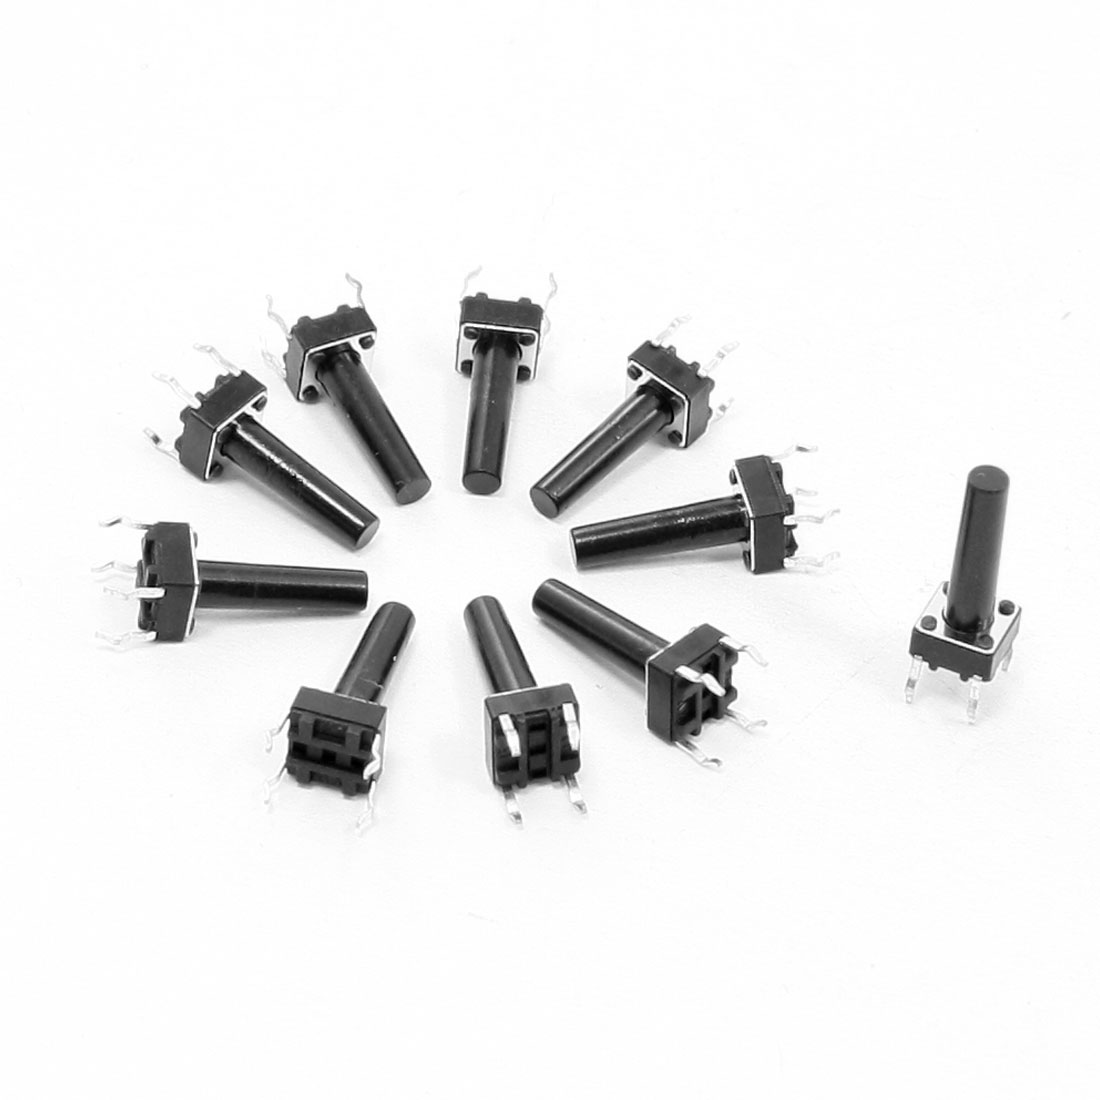 10 Pcs 6x6x16mm 4-Pin DIP PCB Momentary Tactile Tact Push Button Switch